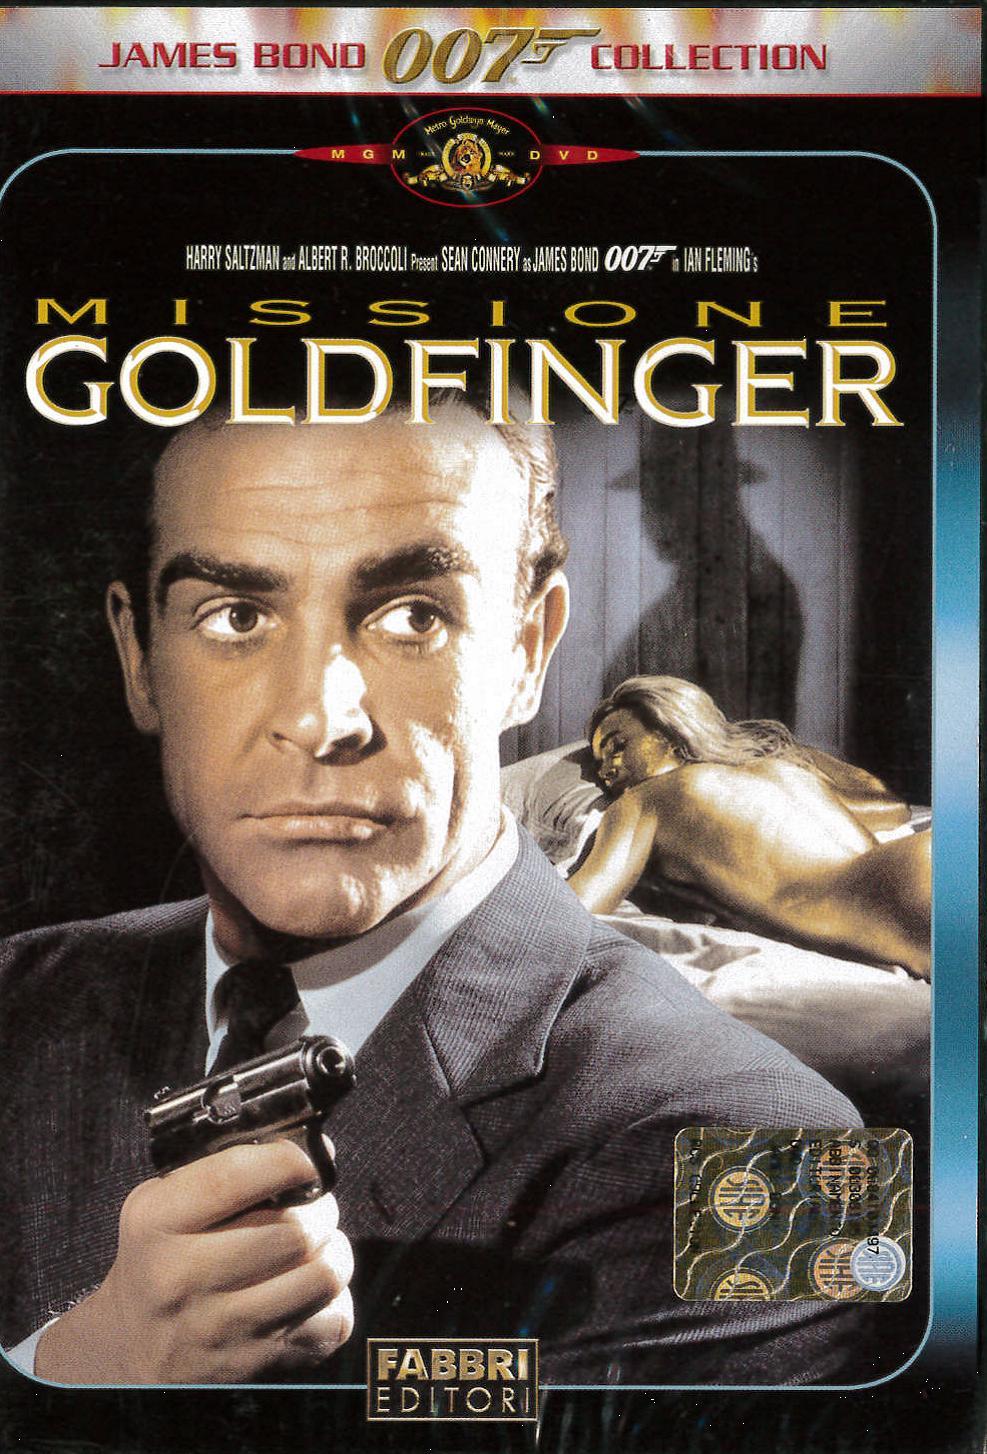 007 - MISSIONE GOLDFINGER (DVD)